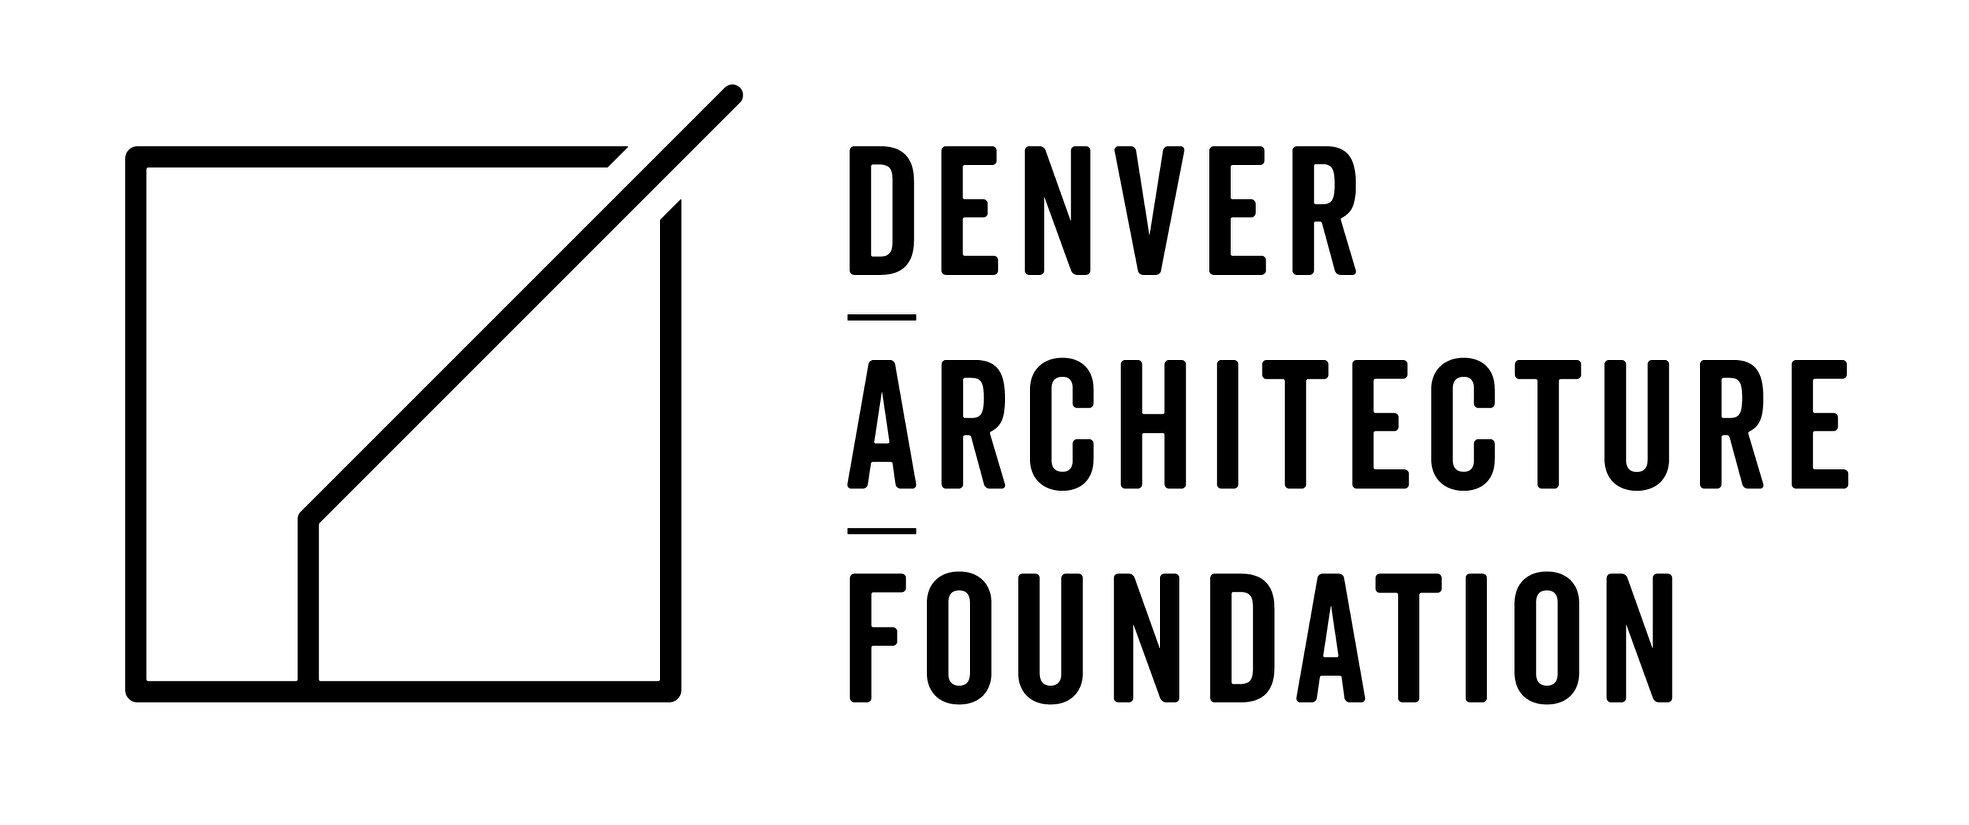 denver-architecture-foundation